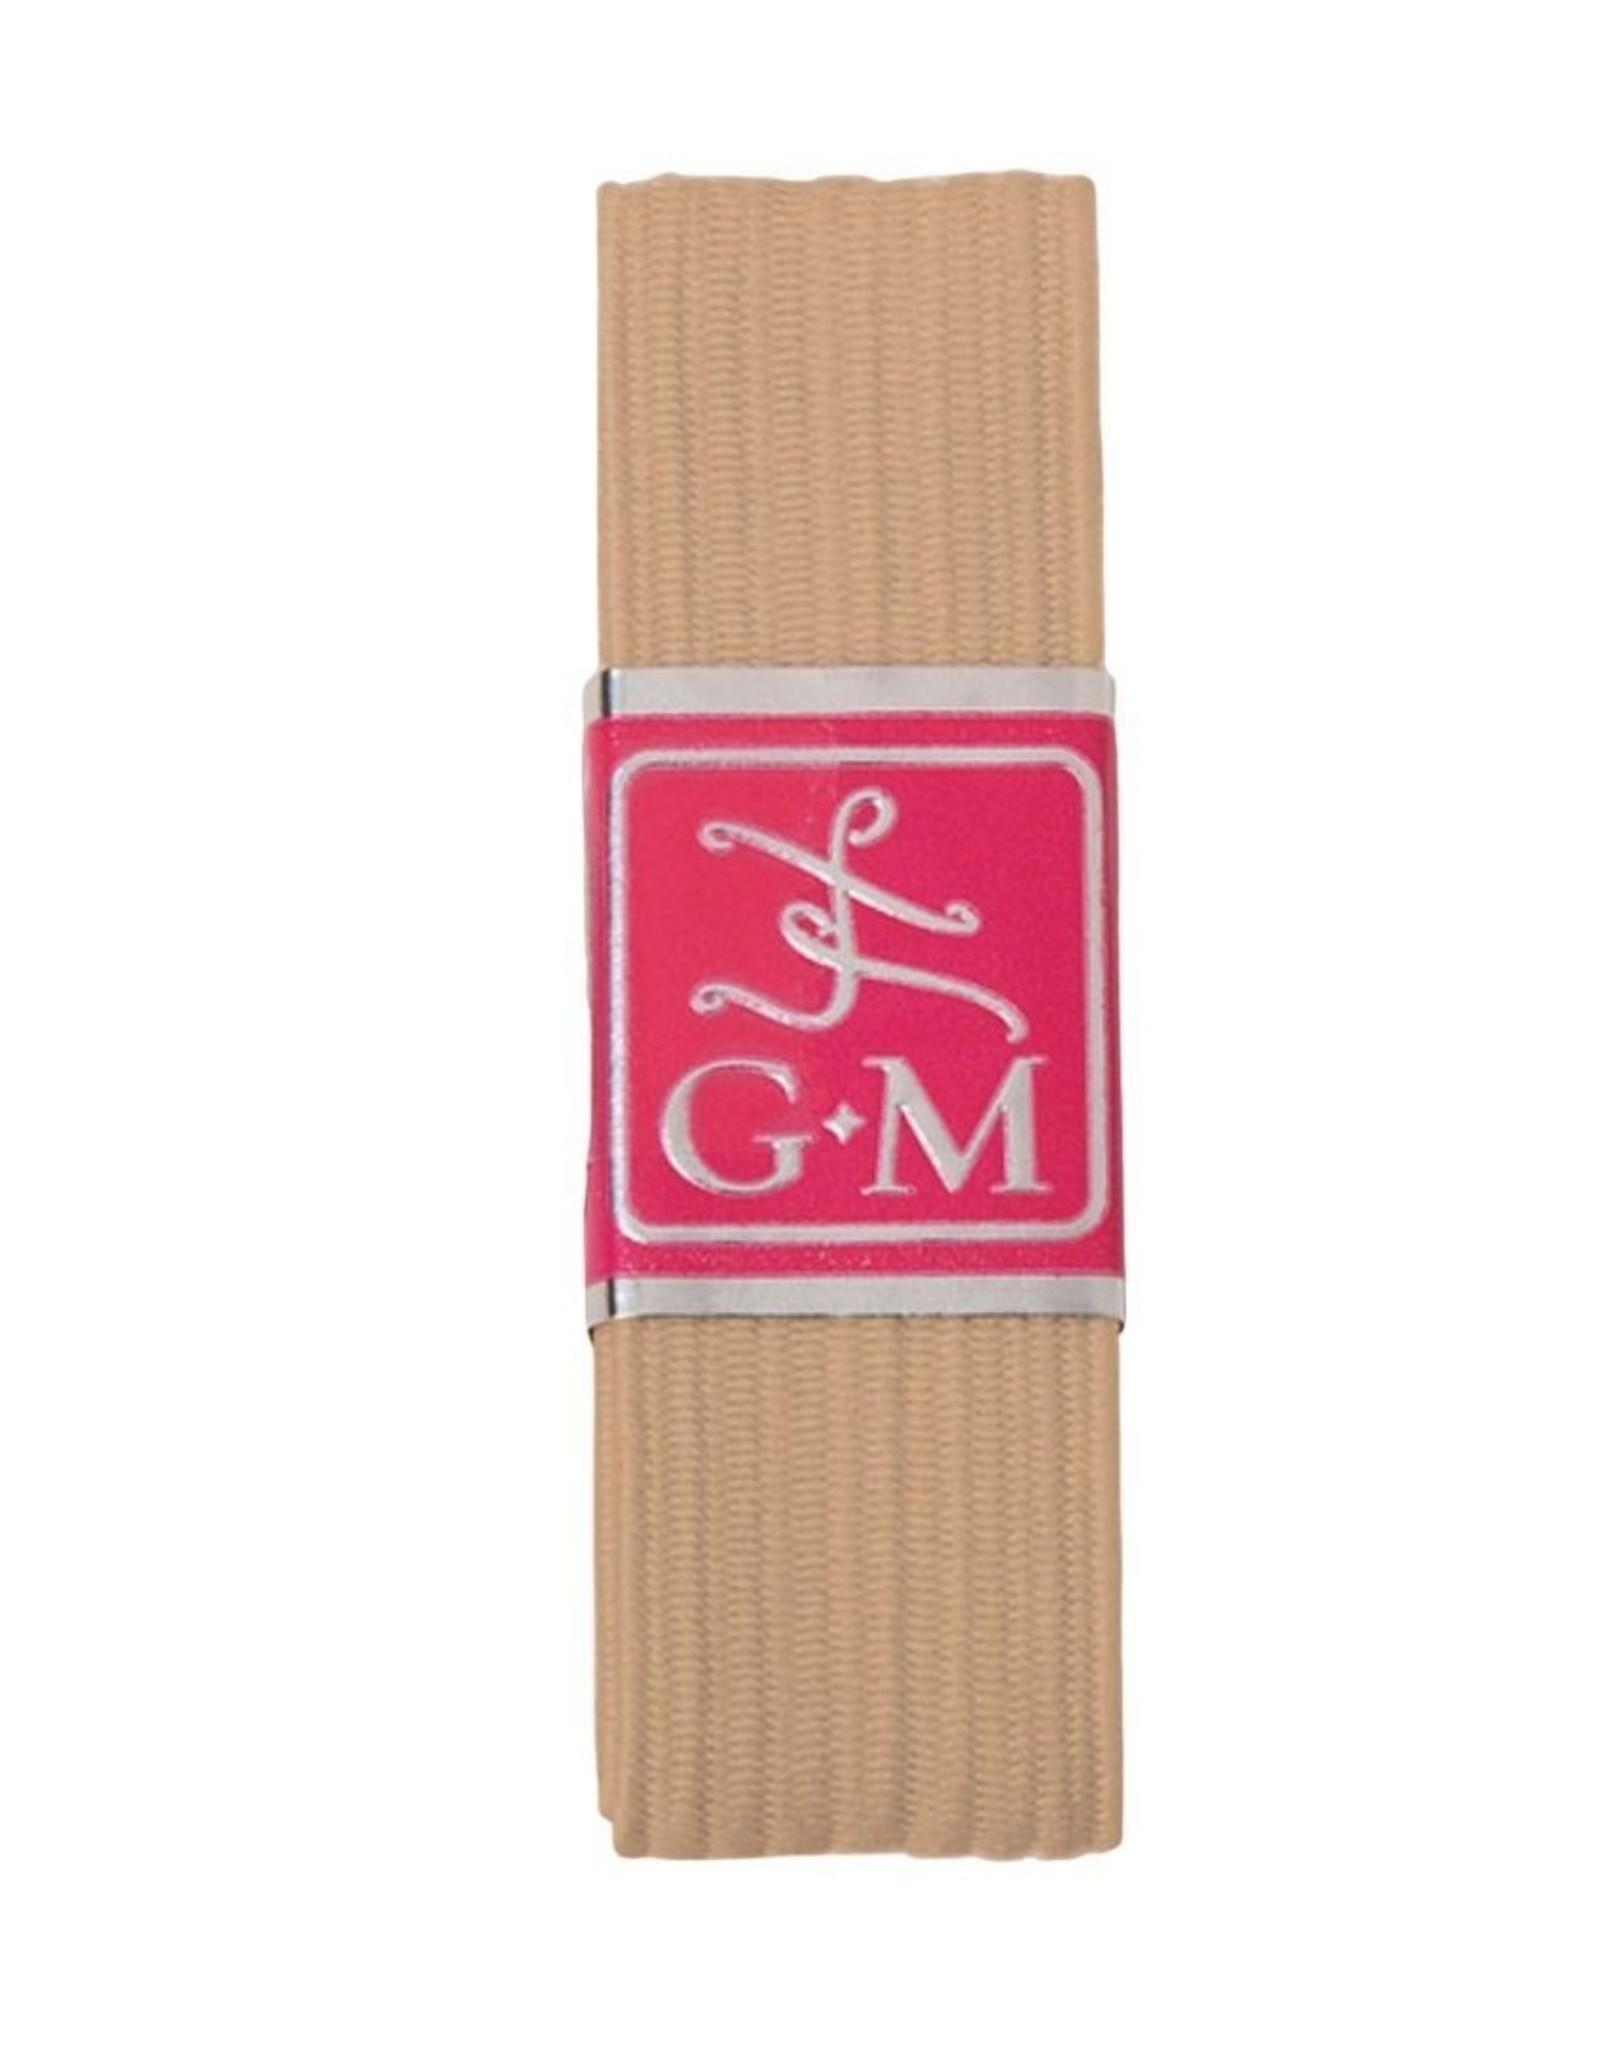 "Gaynor Minden GM 3/4"" Elastic"